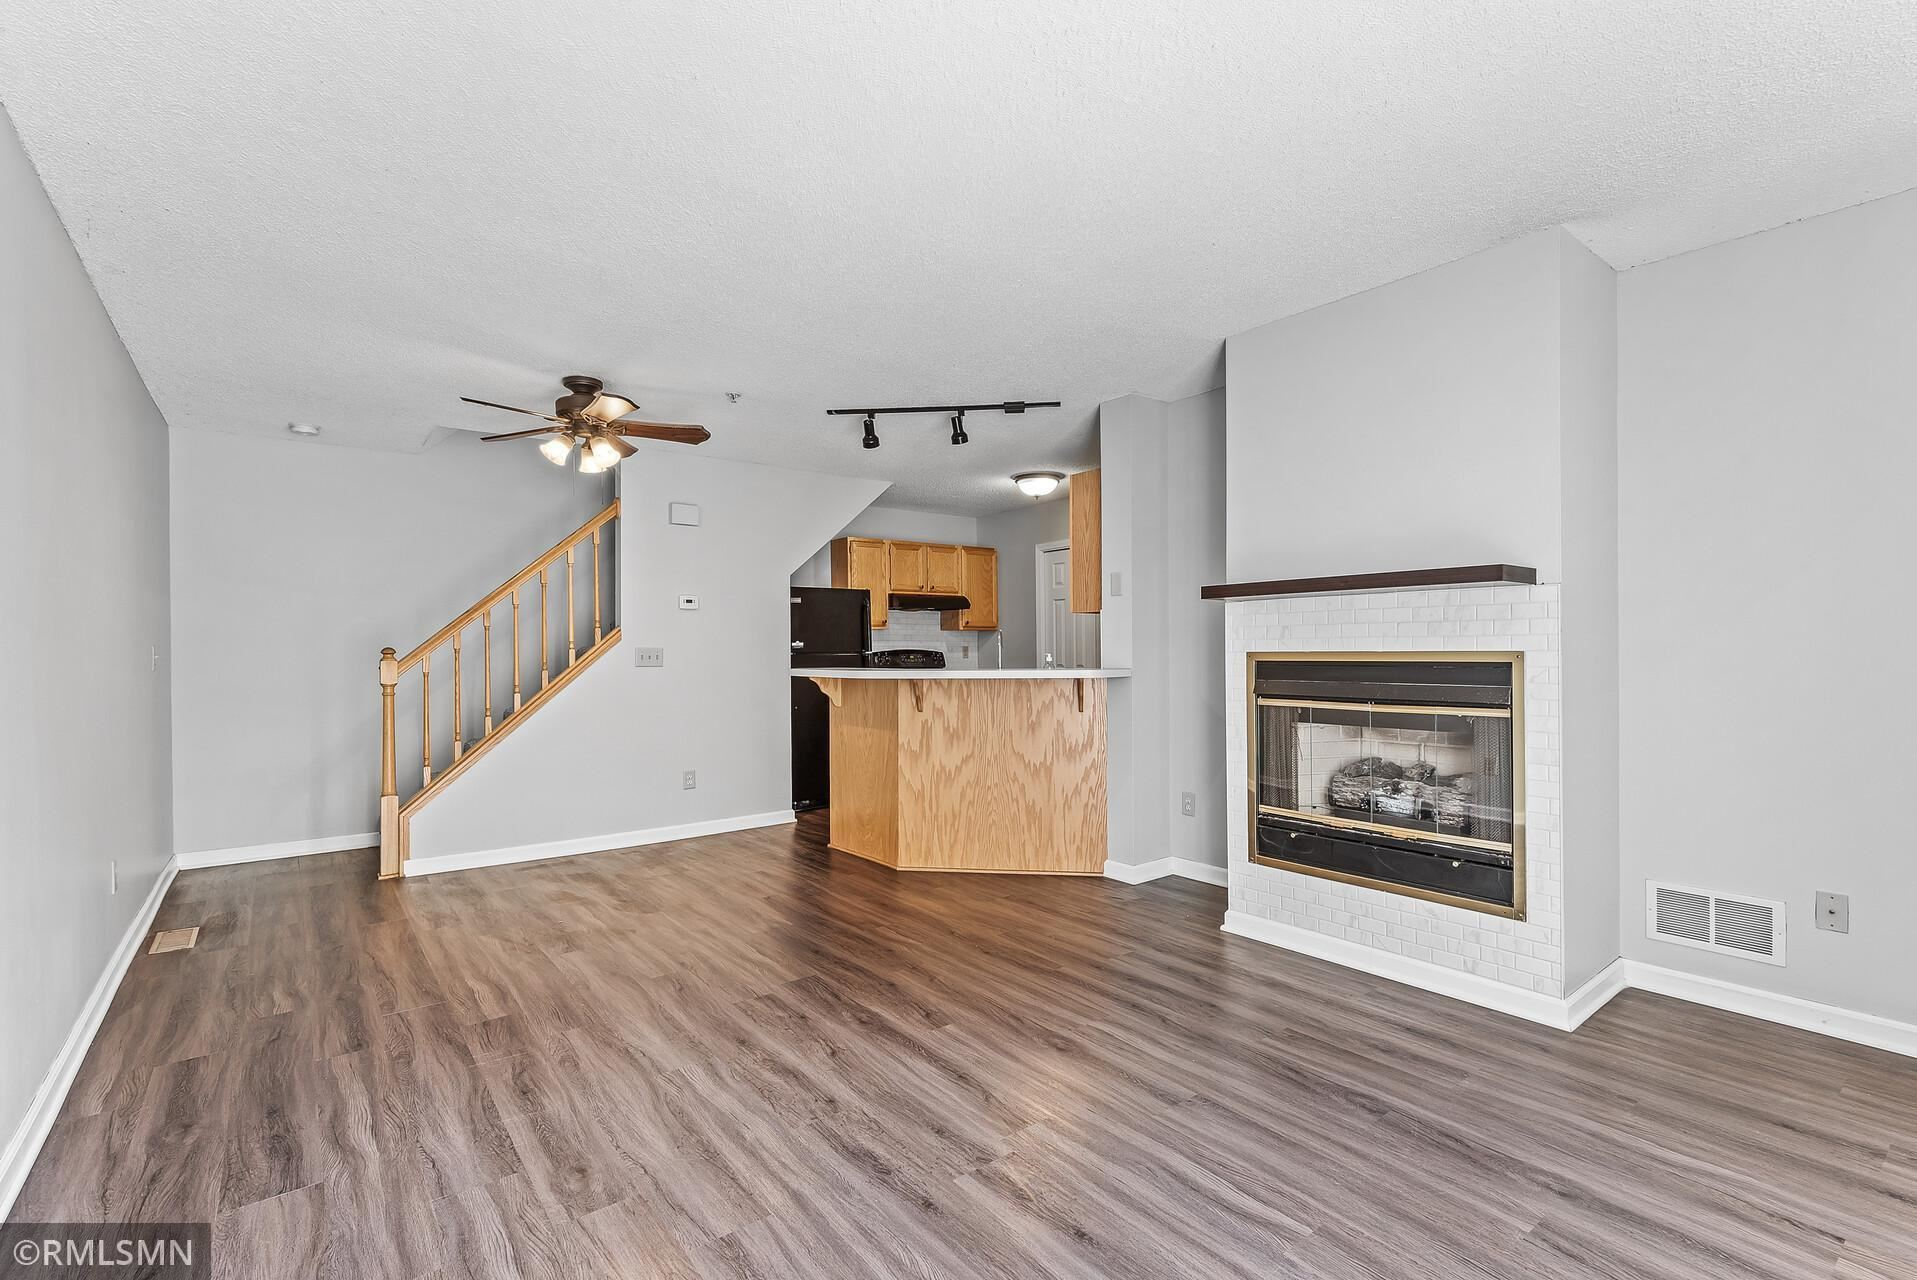 Photo of 3675 Linden Avenue, White Bear Lake, MN 55110 (MLS # 6006638)